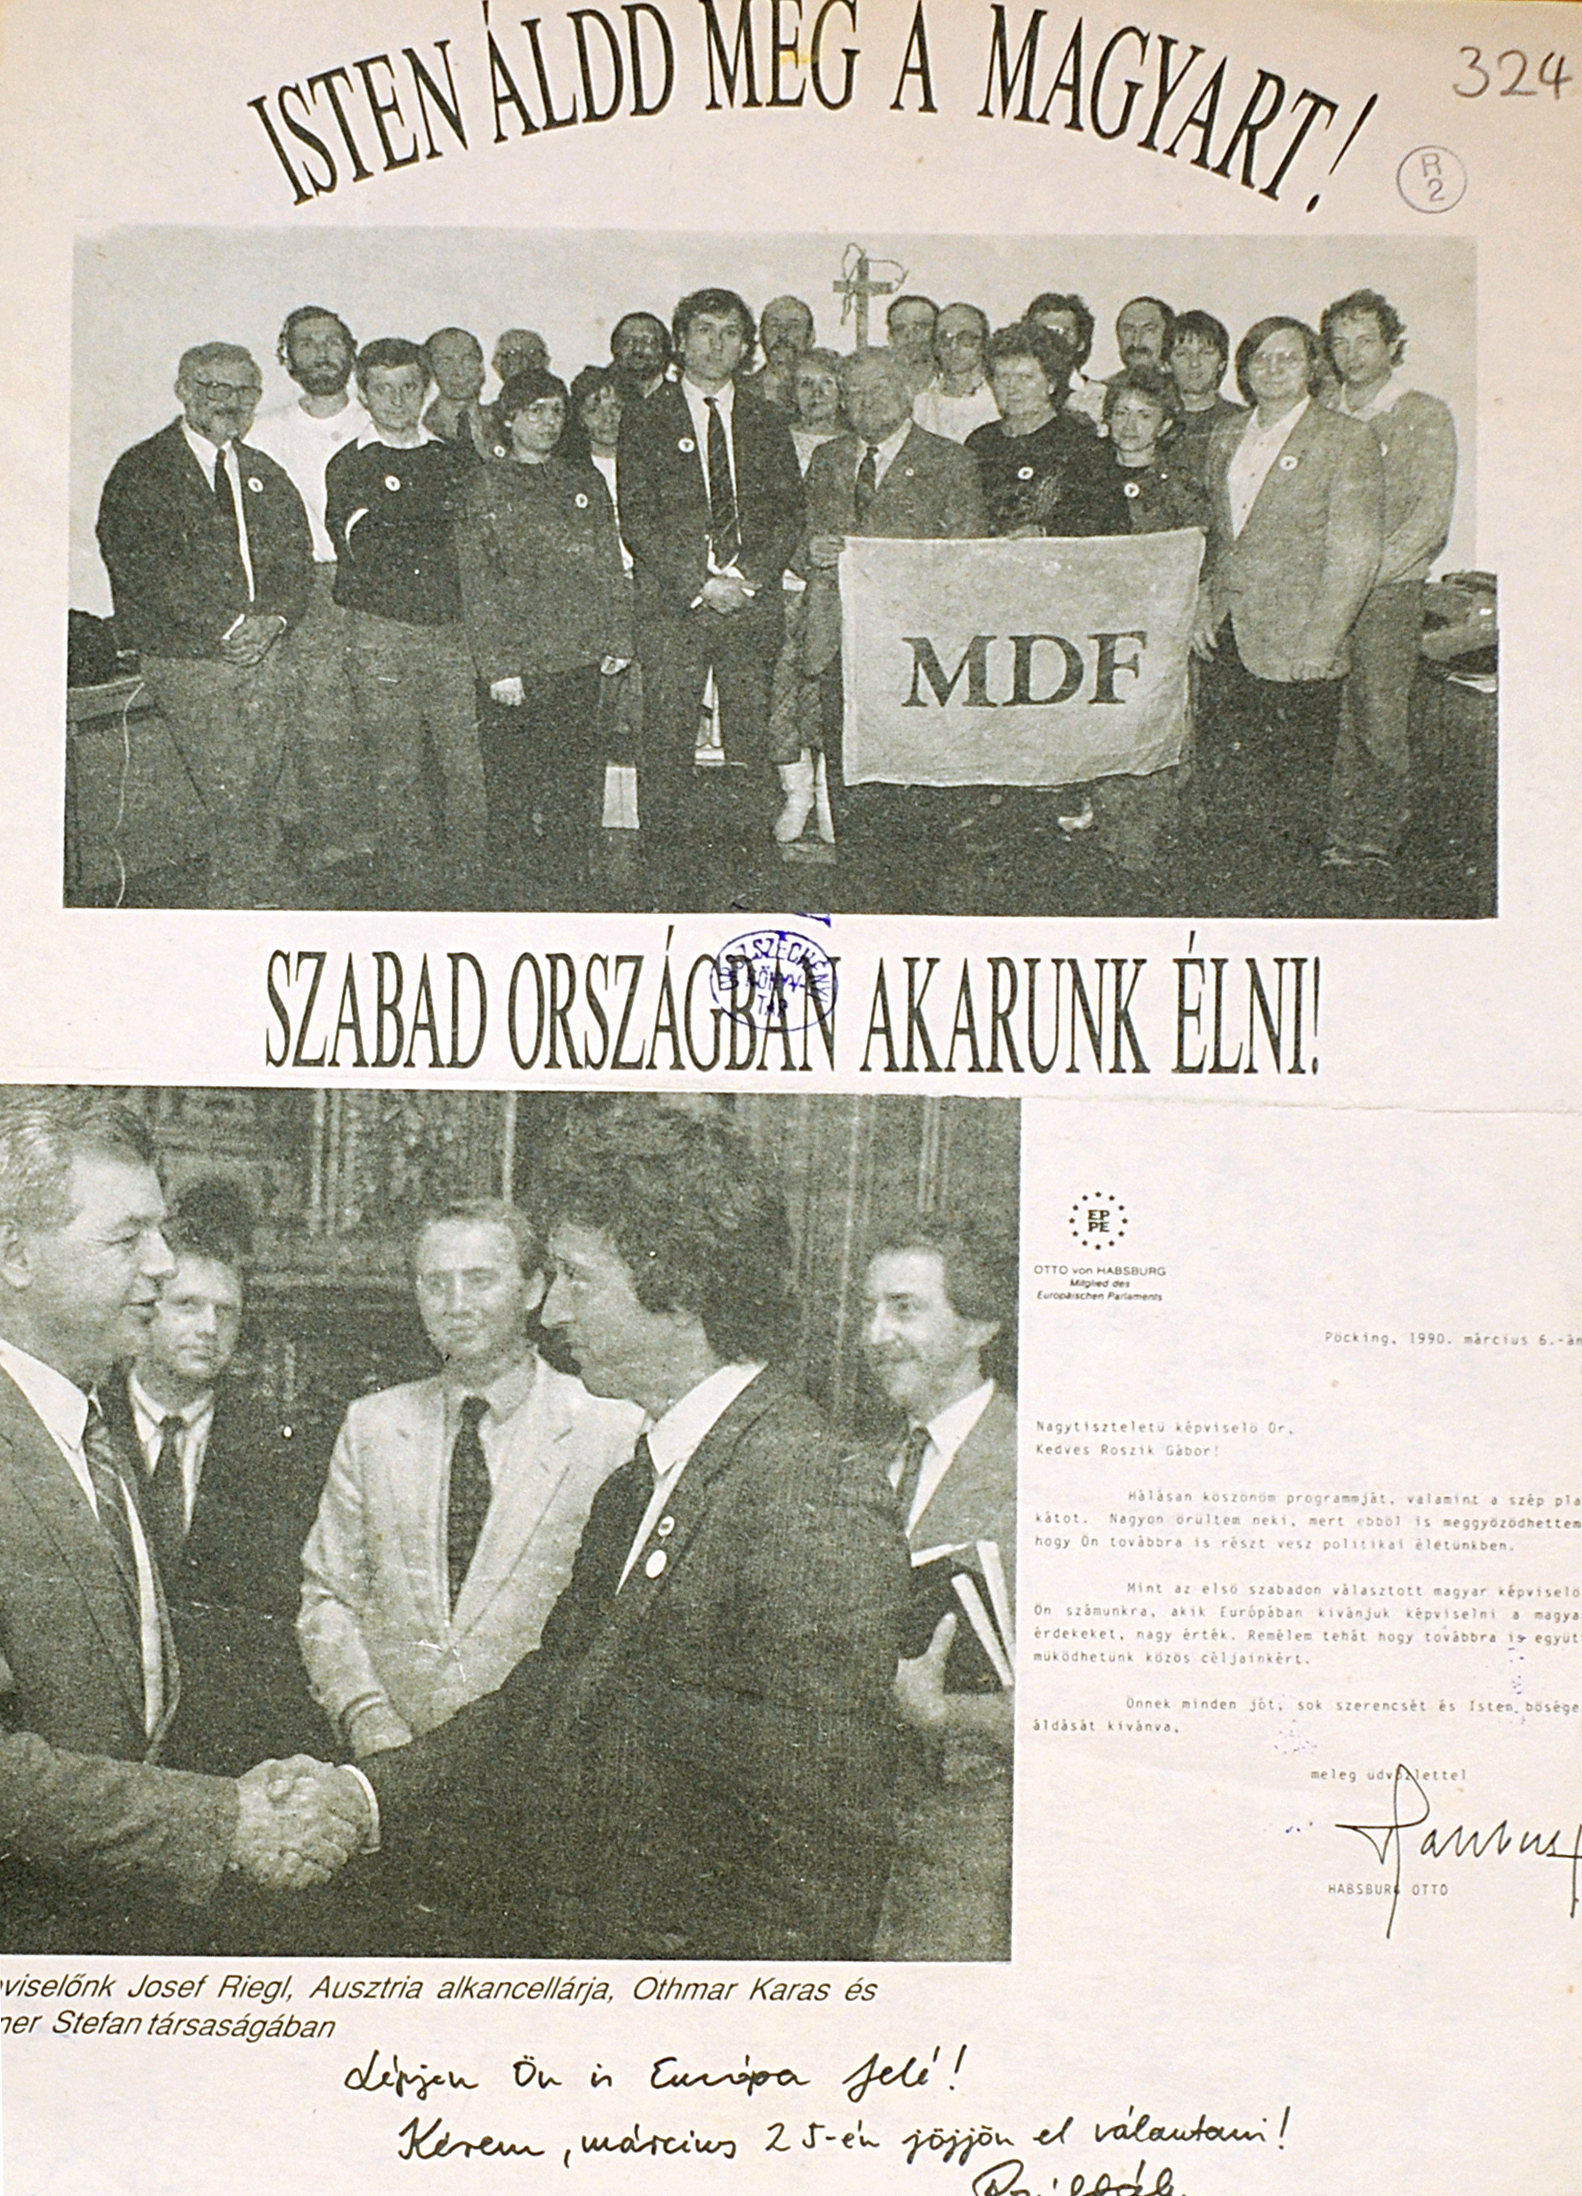 14_mdf_nemzetikonyvtar.JPG